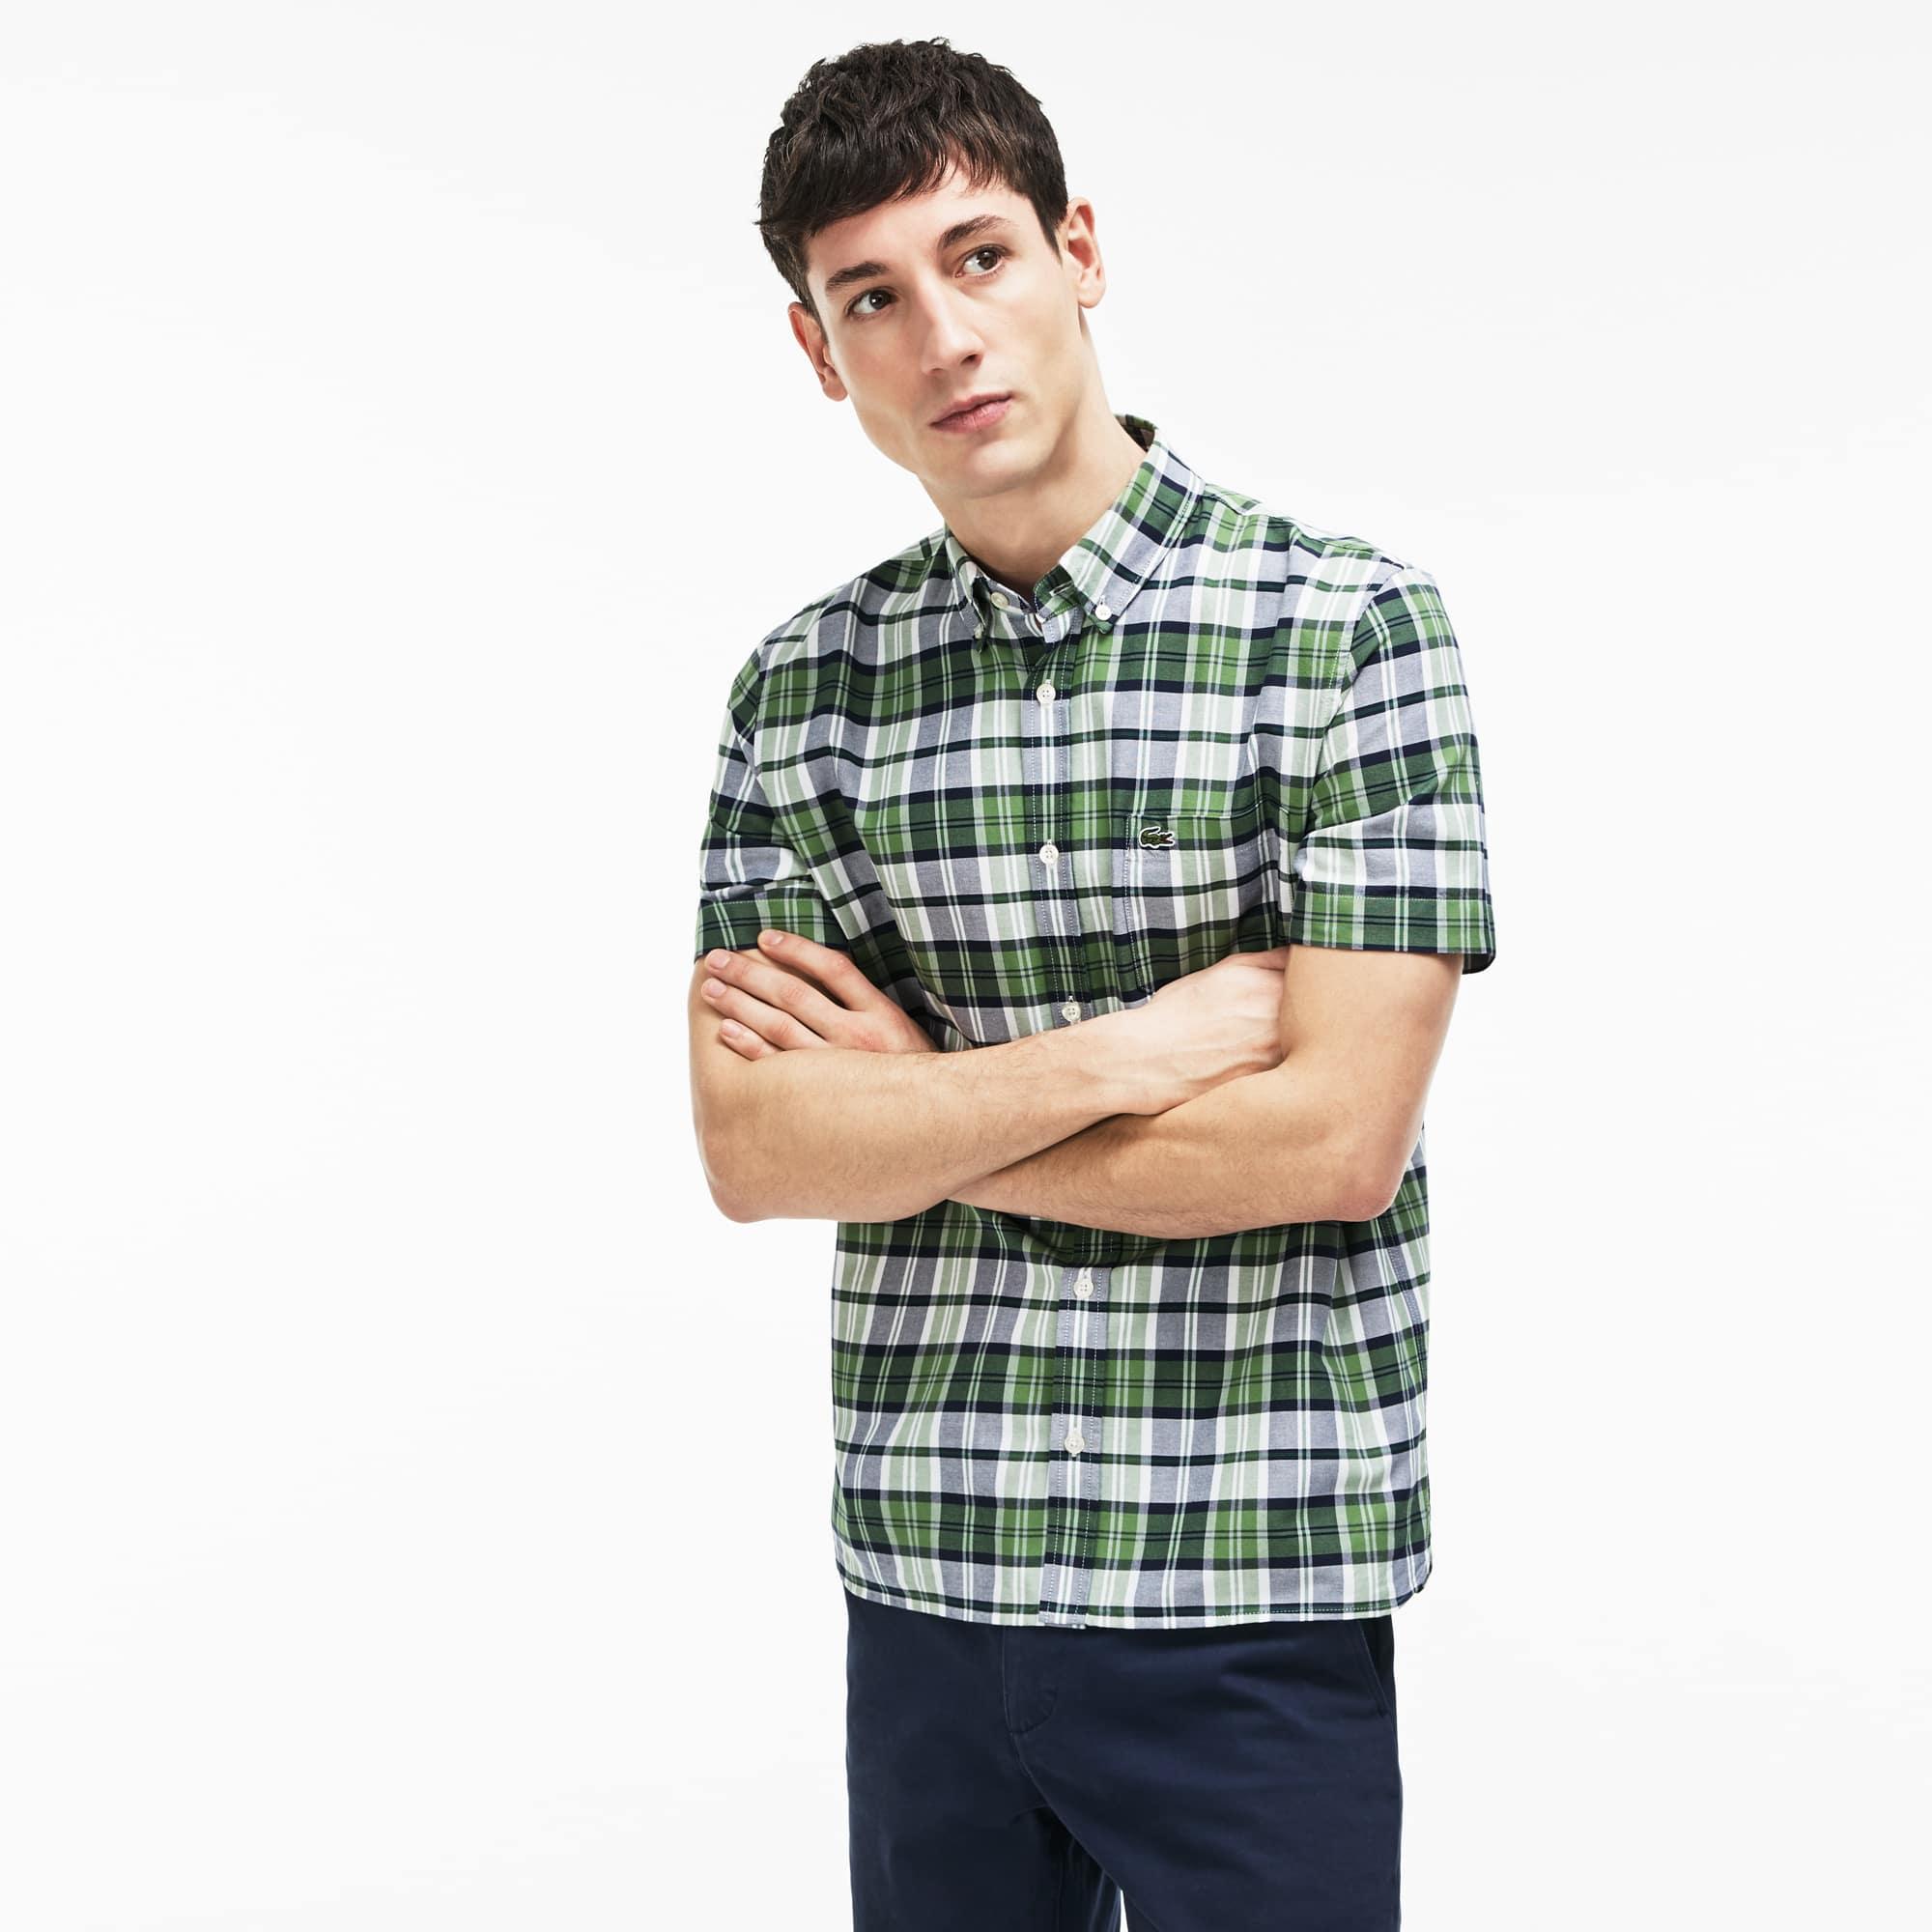 Camisa regular fit de manga corta de algodón Oxford de cuadros de colores